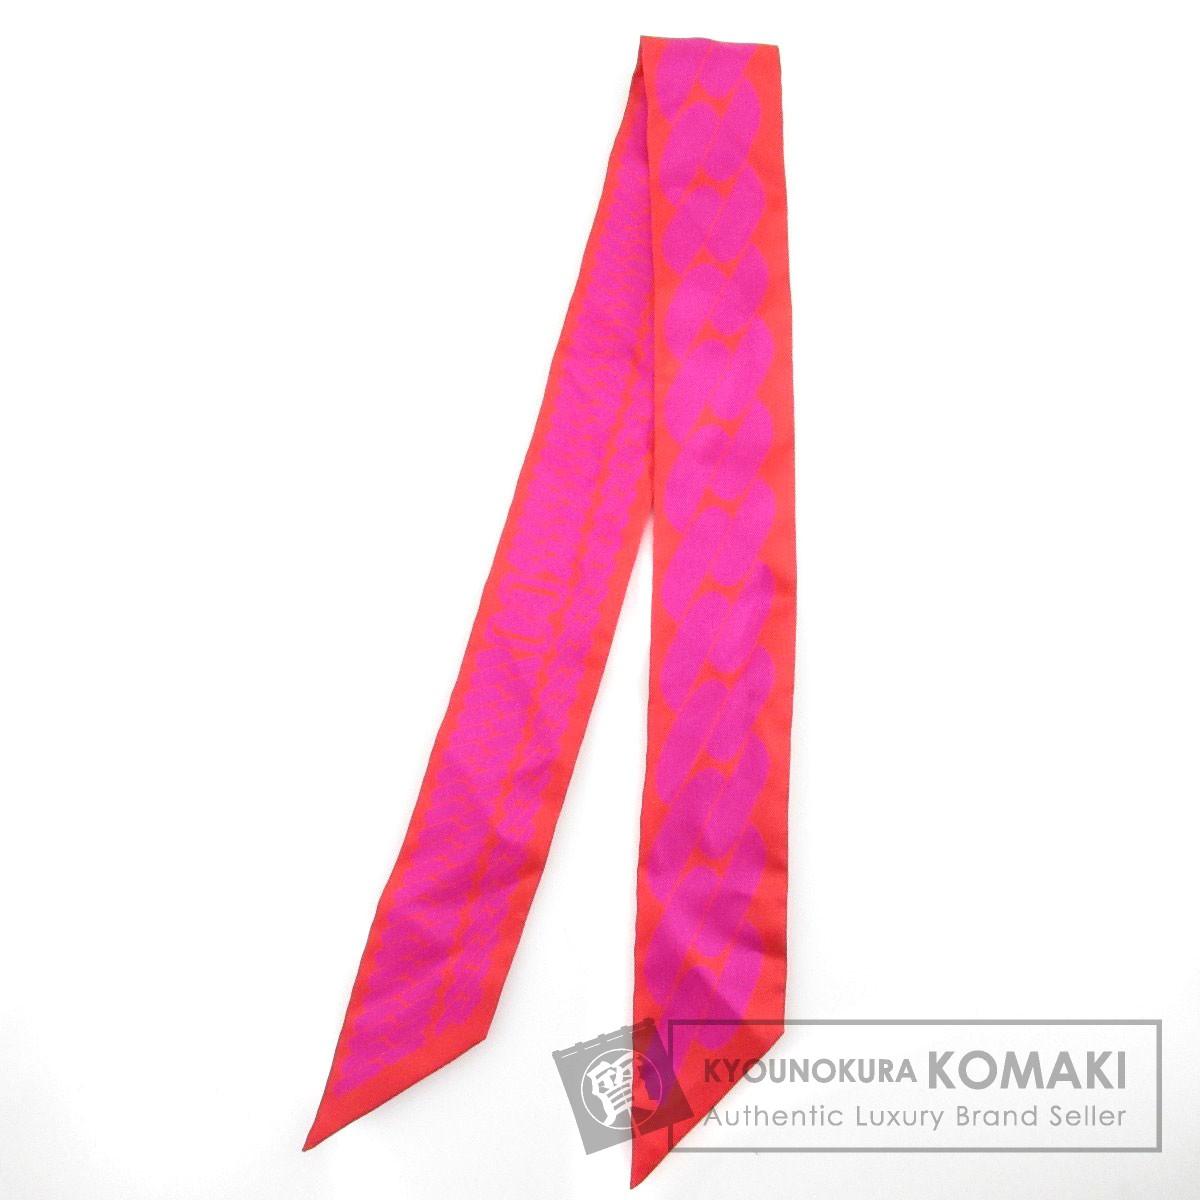 HERMES ツイリー clic c est noue スカーフ シルク レディース 【中古】【エルメス】